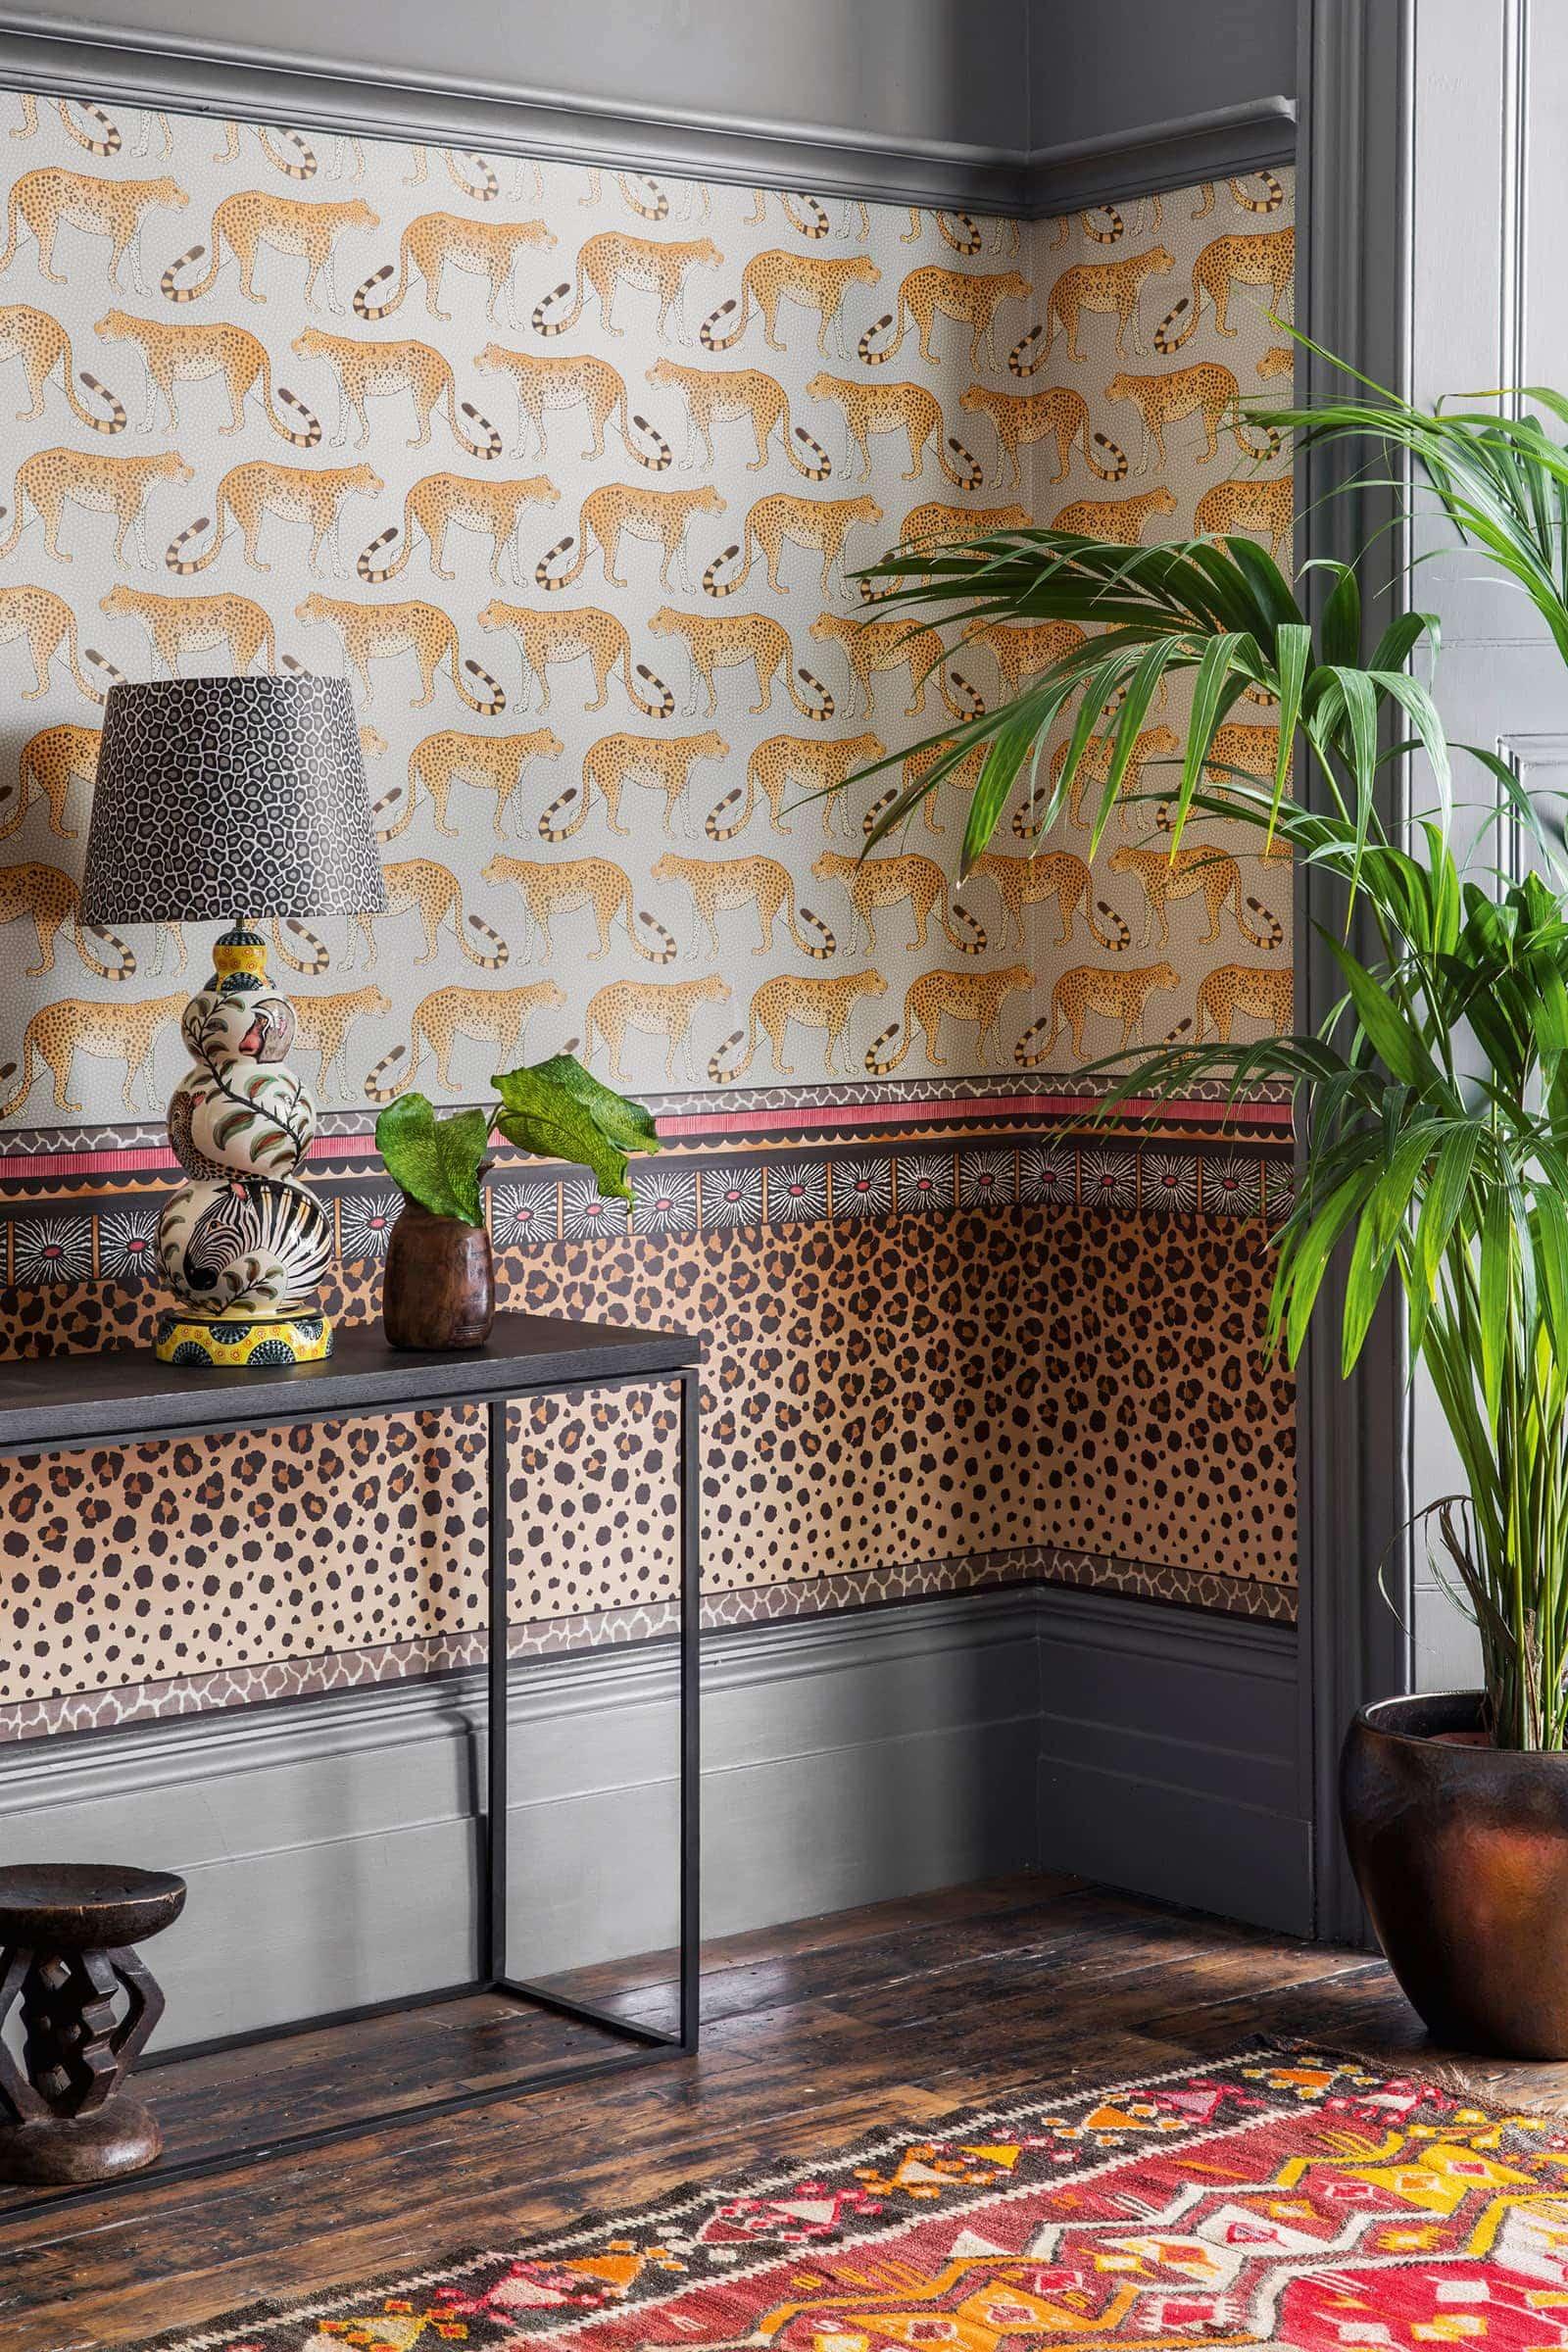 leopard print wallpaper design in hallway animal print in interior design